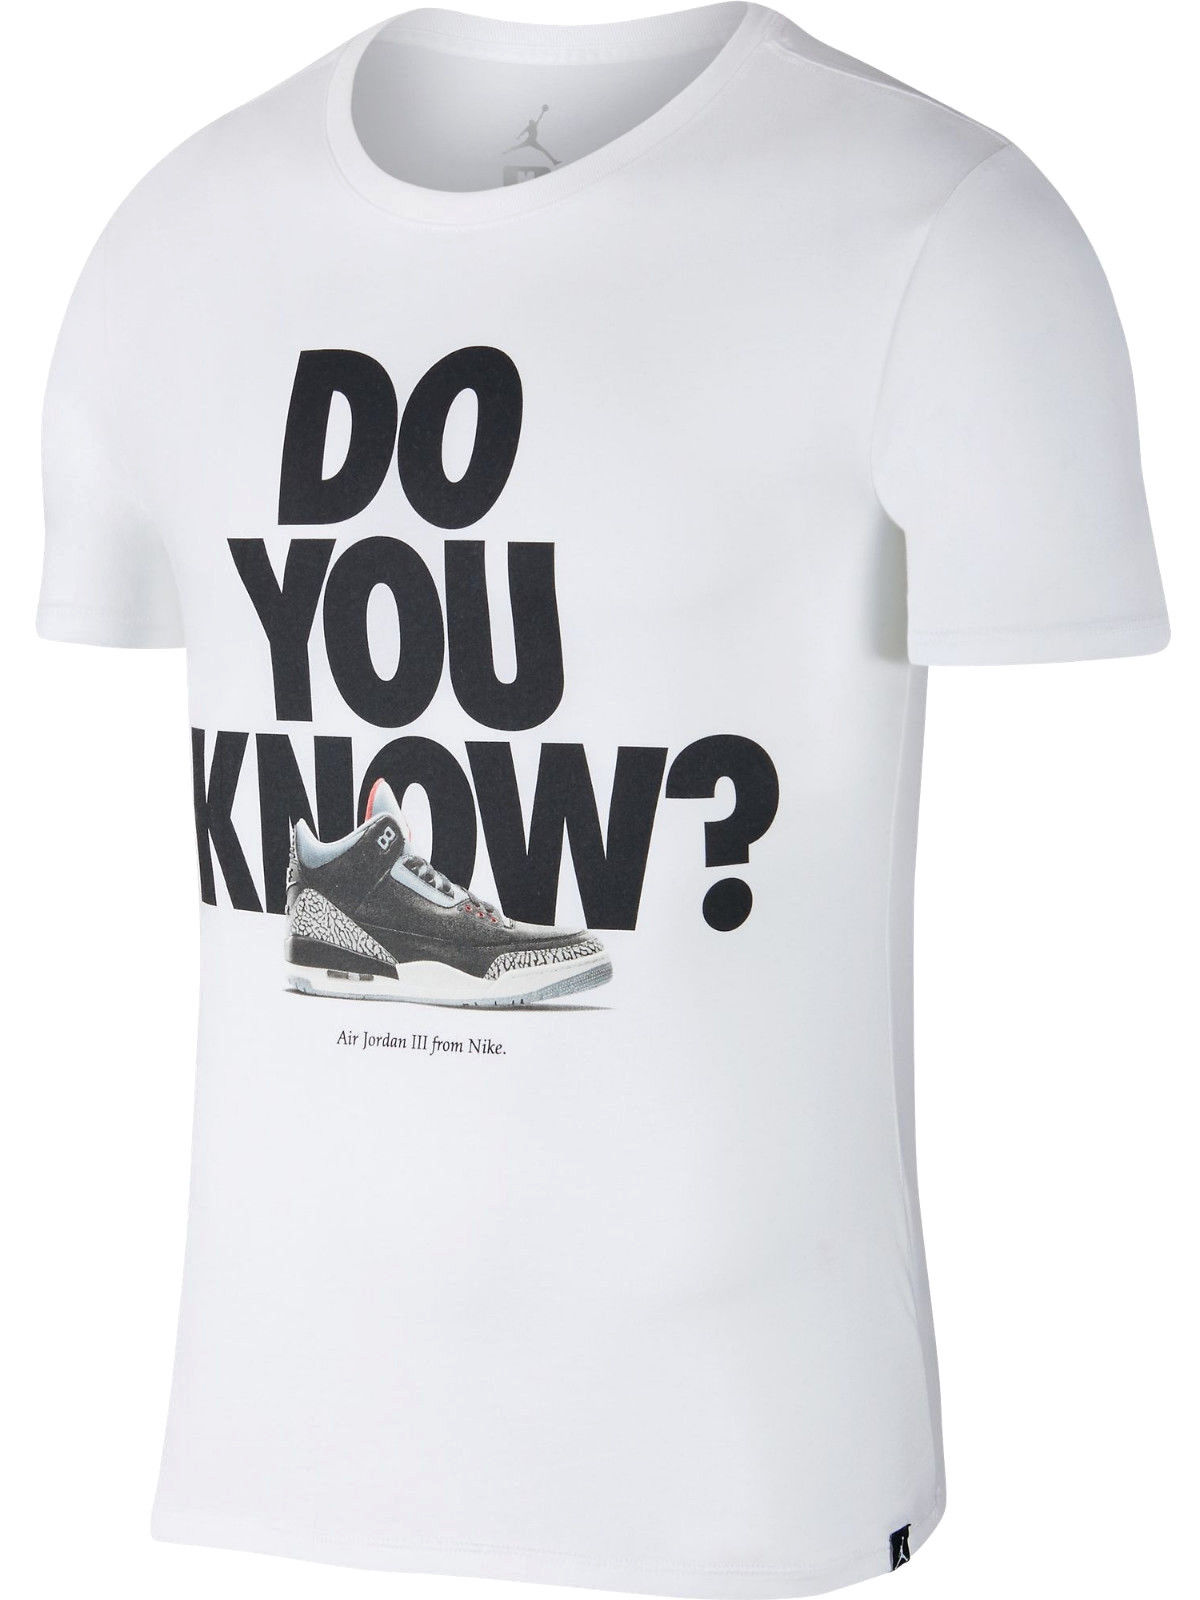 7482172d6d01c7 Jordan - Jordan Men s Retro 3 Do You Know T-Shirt White - Walmart.com